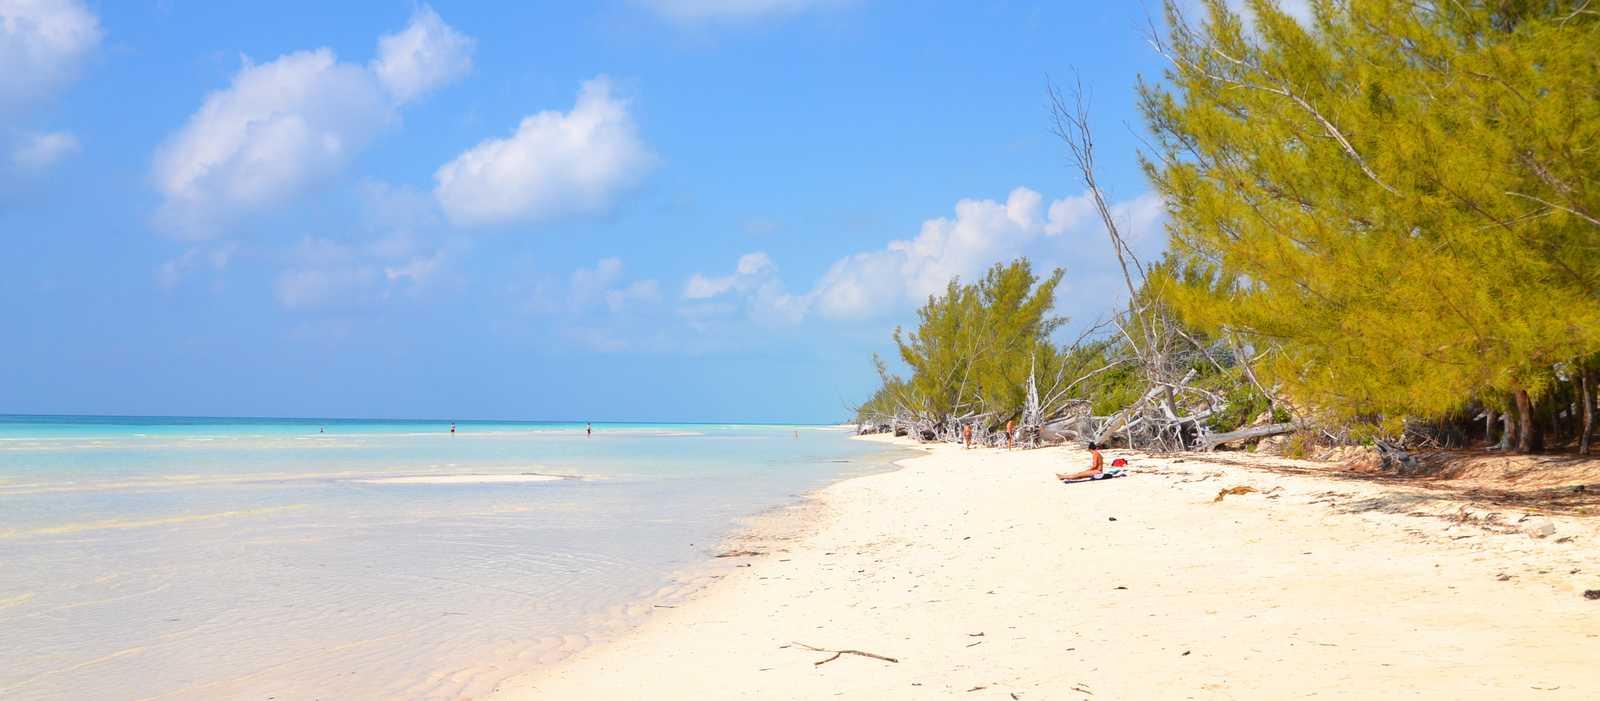 Strand auf der Grand Bahama